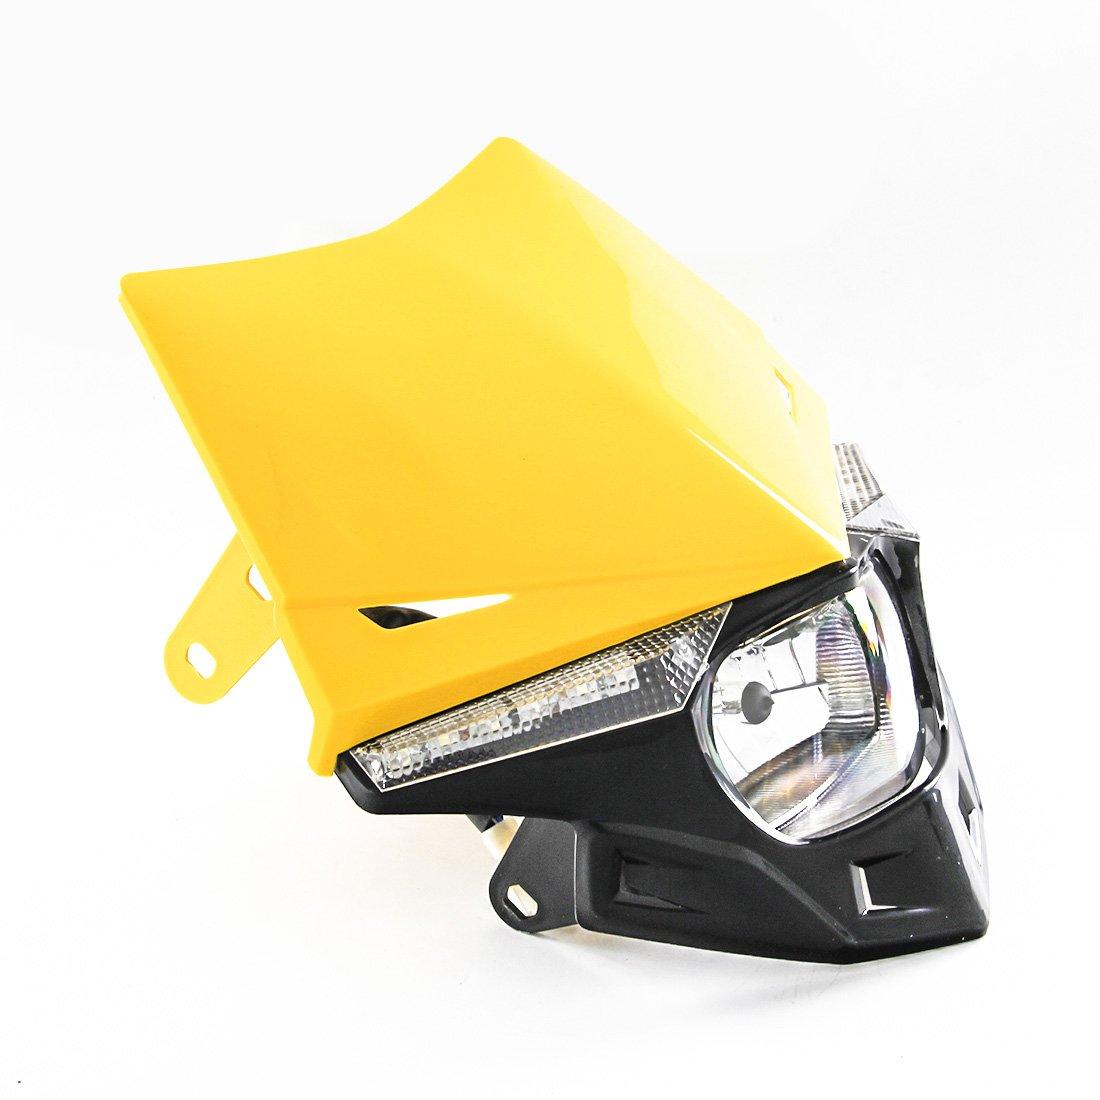 Universale moto fari a LED accensione luce motocross Enduro Dirt Pit Bike faro per Honda CR125 150 CR250 CRF250 CRF450 CR500 XR250 arancione